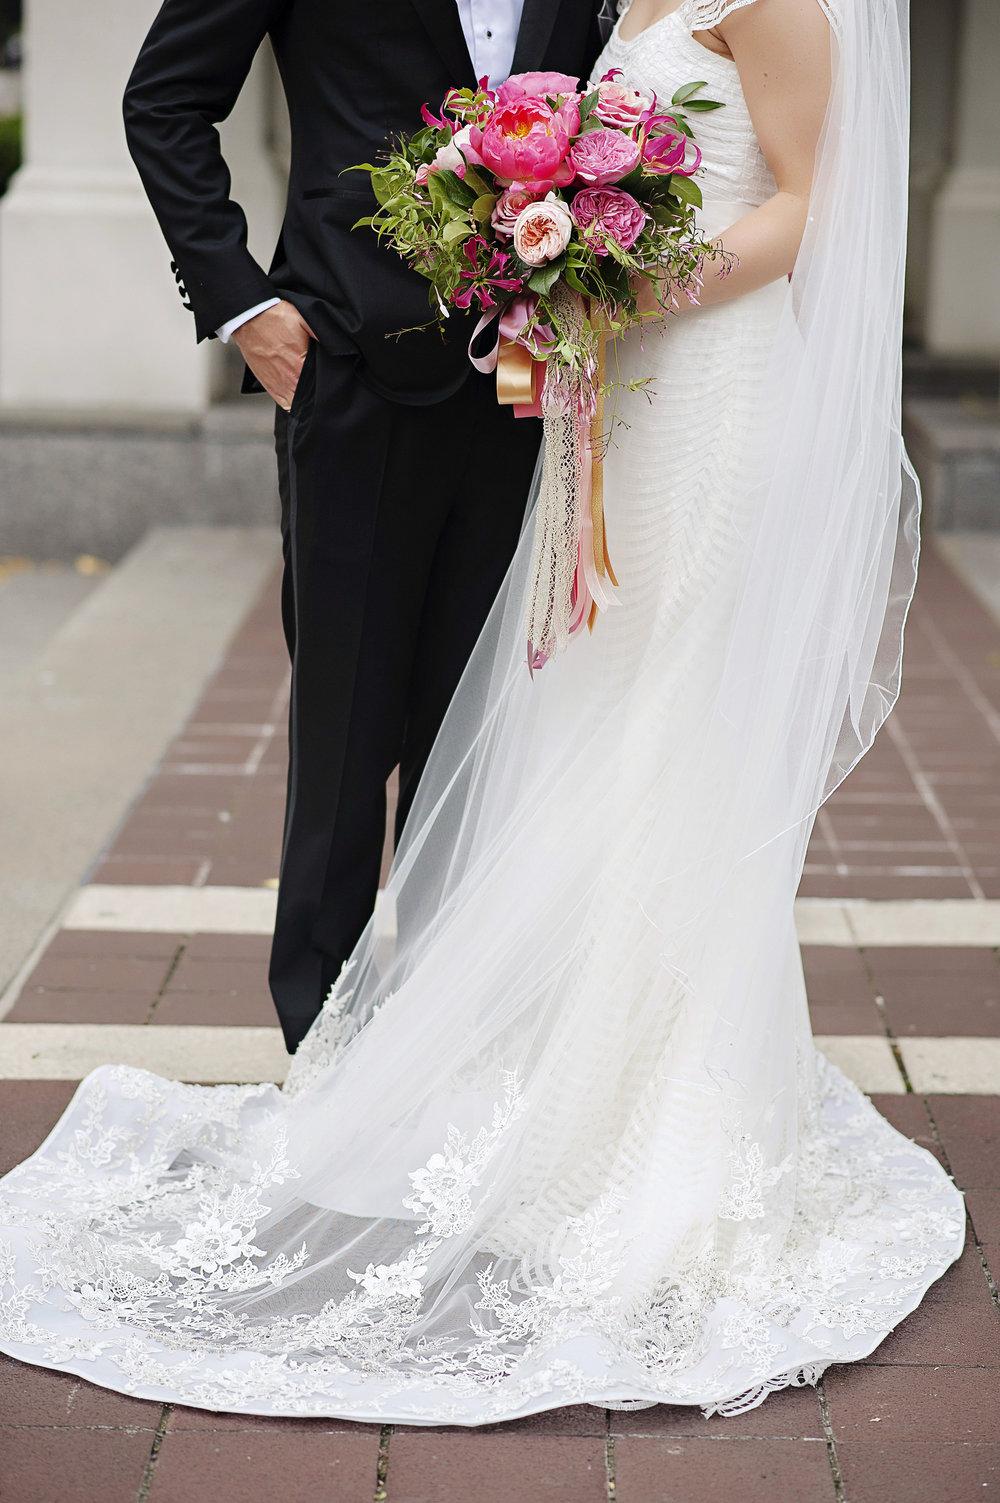 Cincinnati Wedding Flowers - Hilton Netherland Plaza, Courtenay Lambert Florals, Kortnee Kate Photography